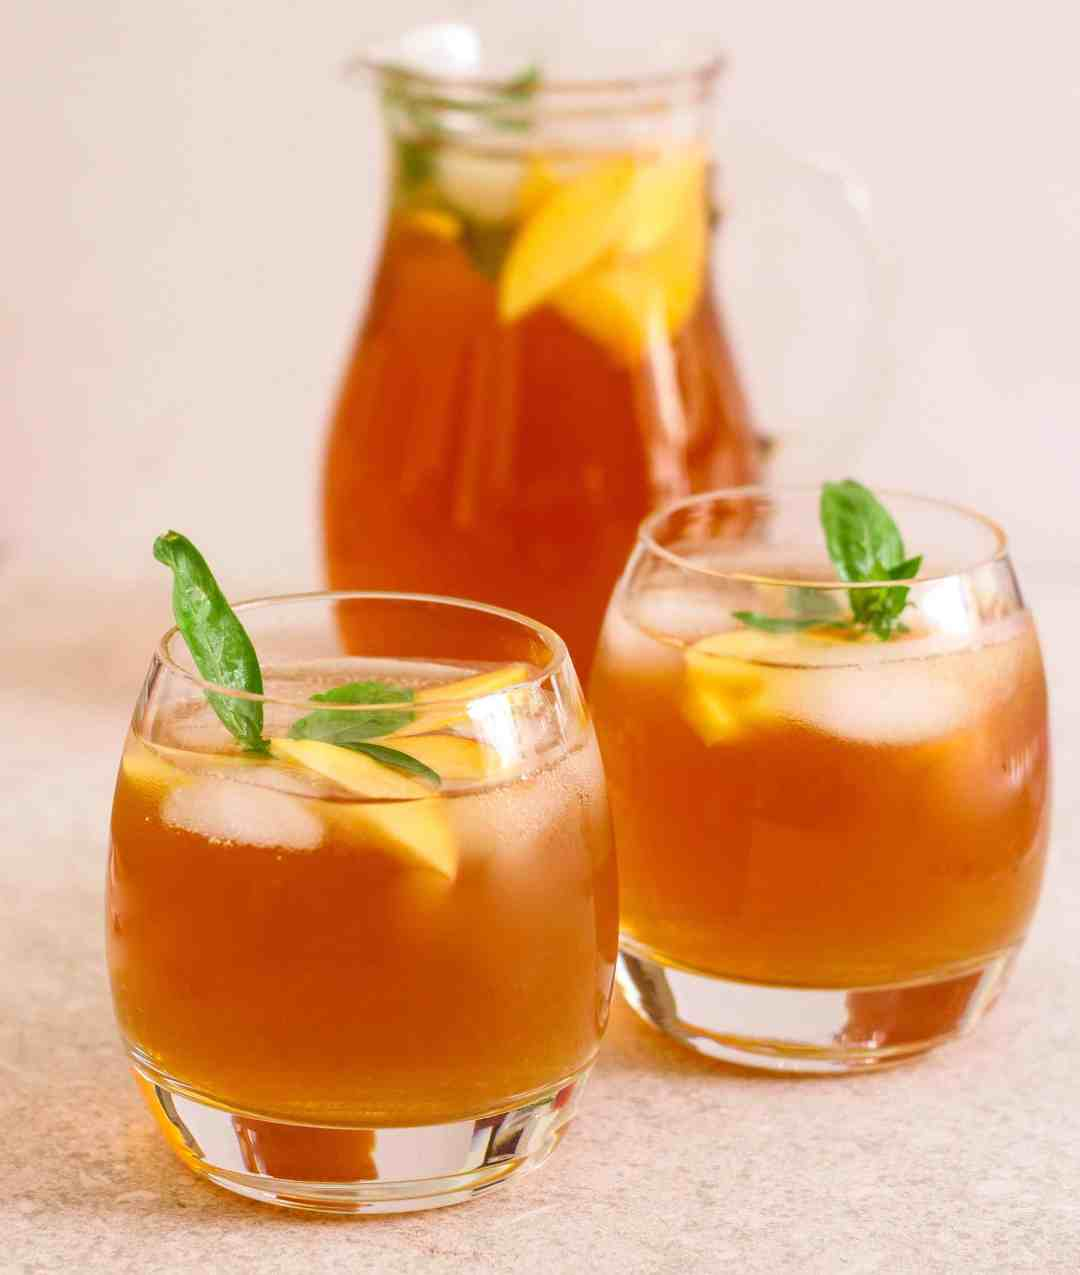 Peach Iced Tea cold brew summer drink fruits